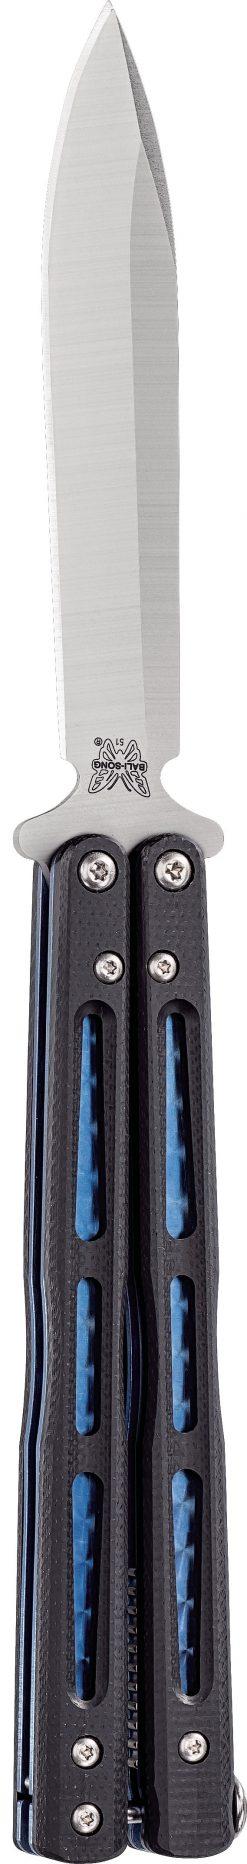 Benchmade 51 Morpho Bali-Song D2 Blade Black G-10 Handle Front Side Open